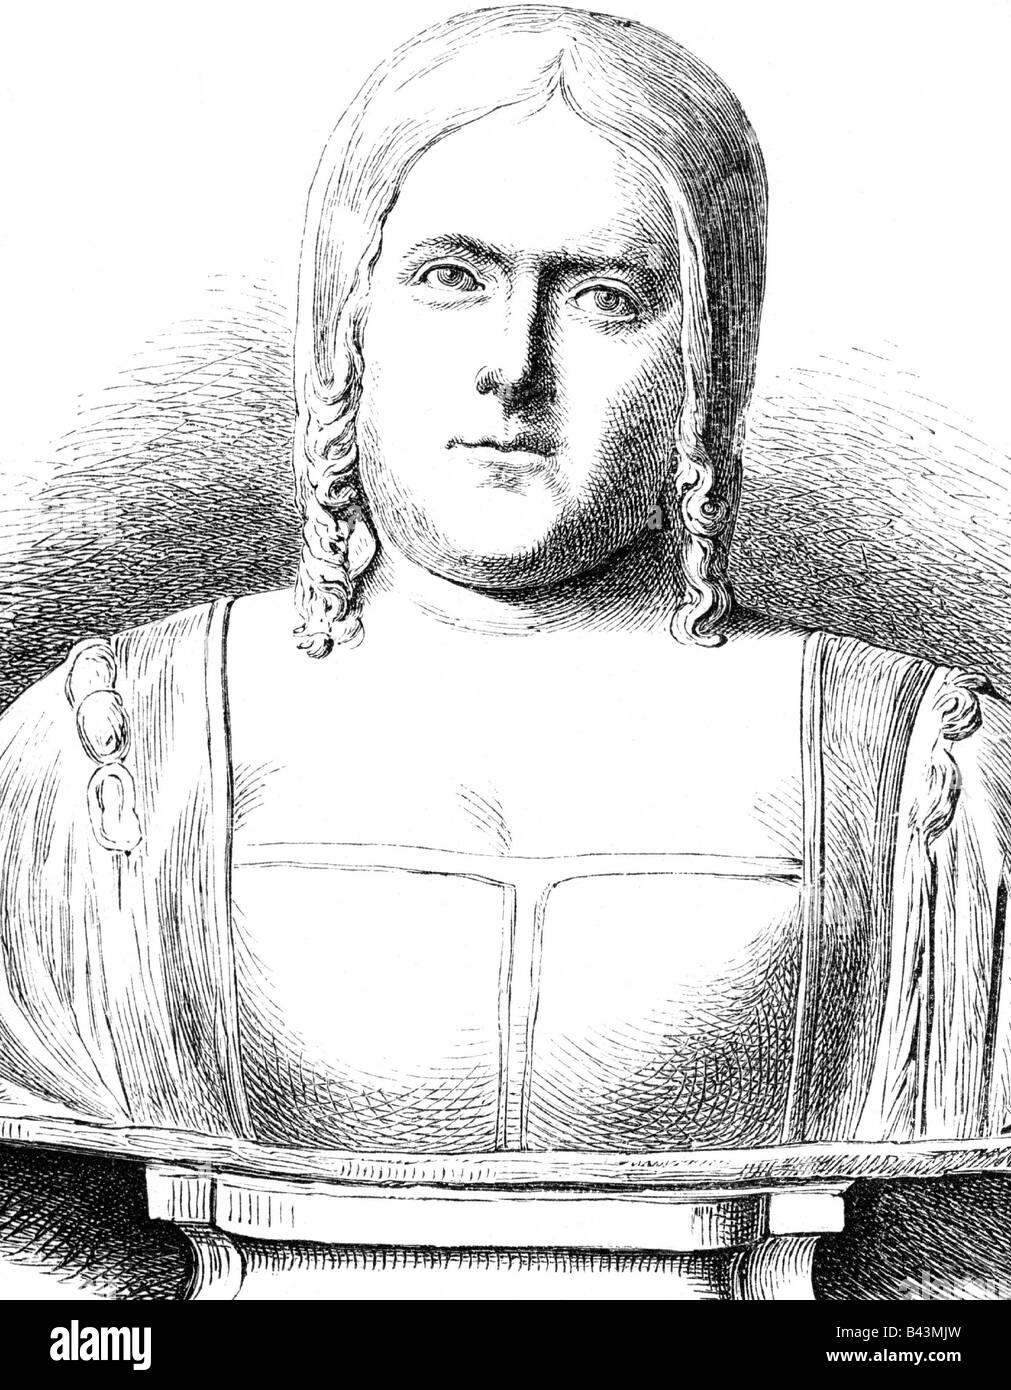 Cornaro, Catarina, 25.11.1454 - 10.7.1510, Queen on Jerusalem, Armenia and Cyprus 1474 - 1489, portrait, wood engraving - Stock Image